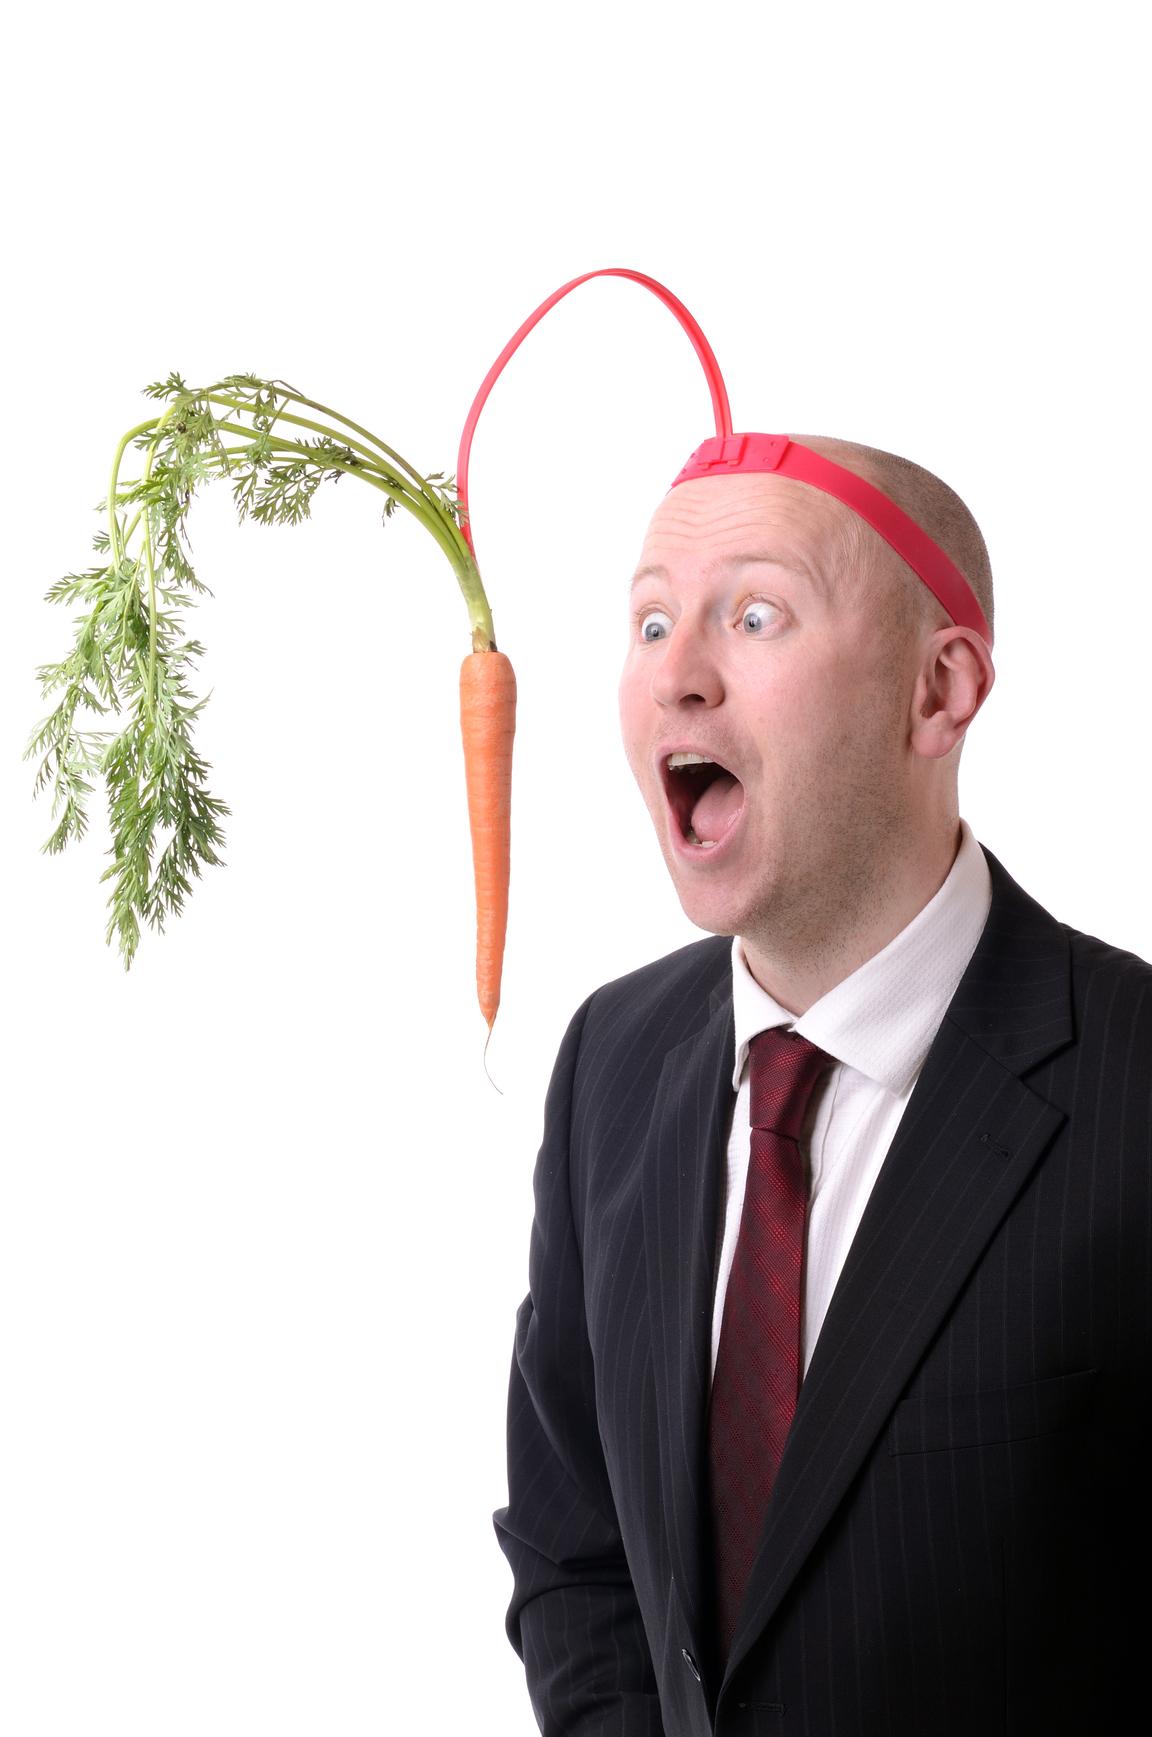 Man-chasing-carrot.jpg